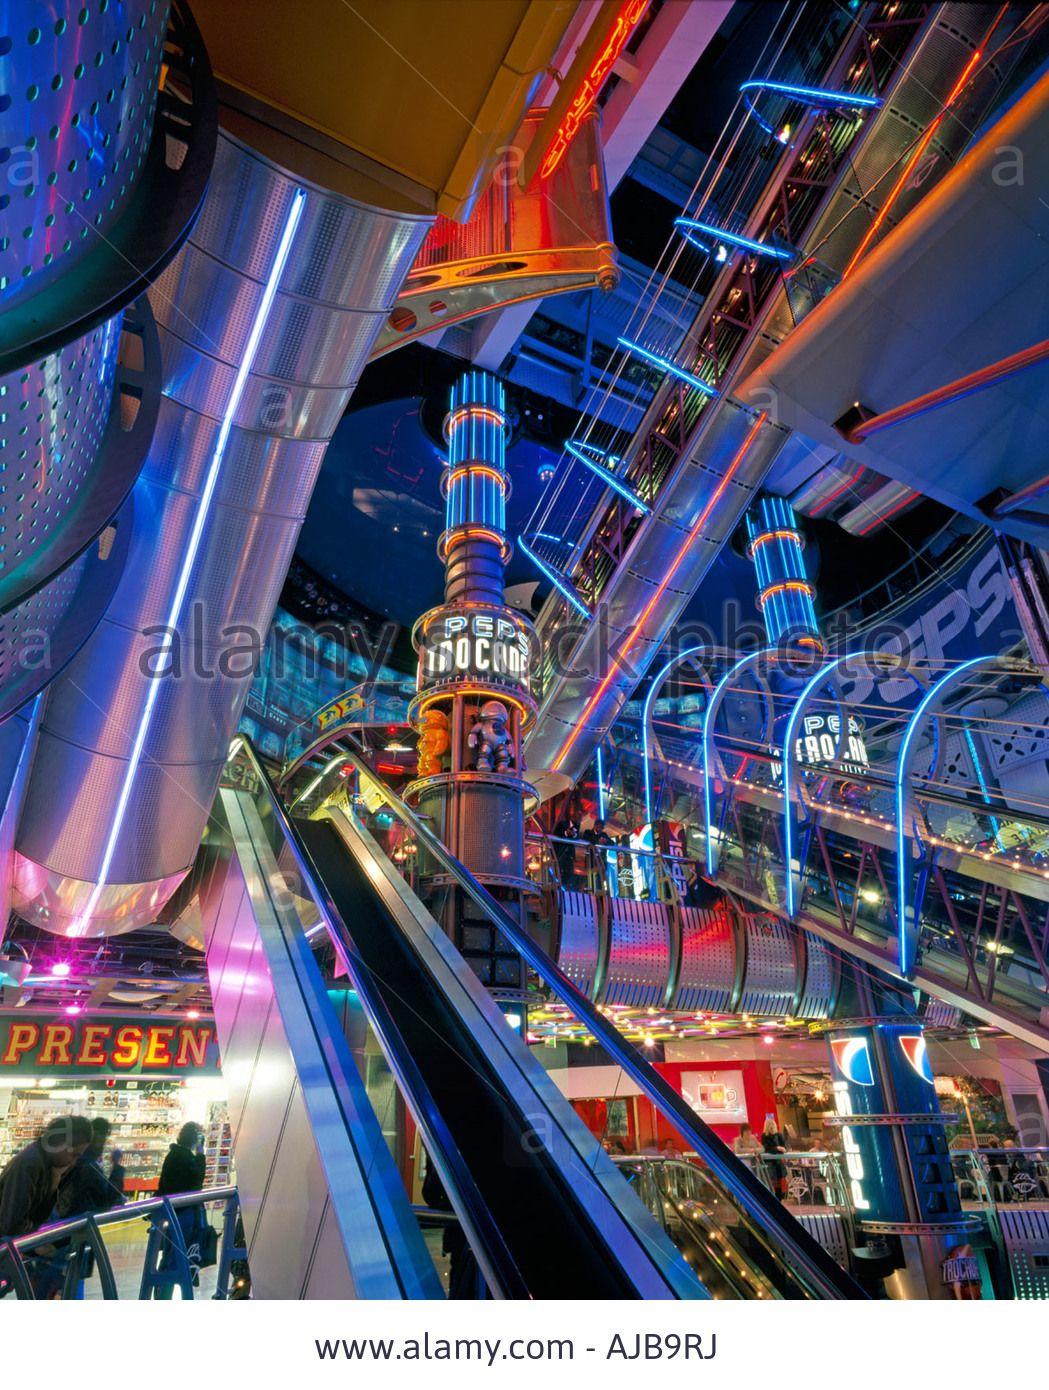 Futuristic Space Age Interiors Of London Trocadero With Neon Lights Ajb9rj Jpg 1049 1390 Shopping Mall Interior Parking Design Futuristic Architecture